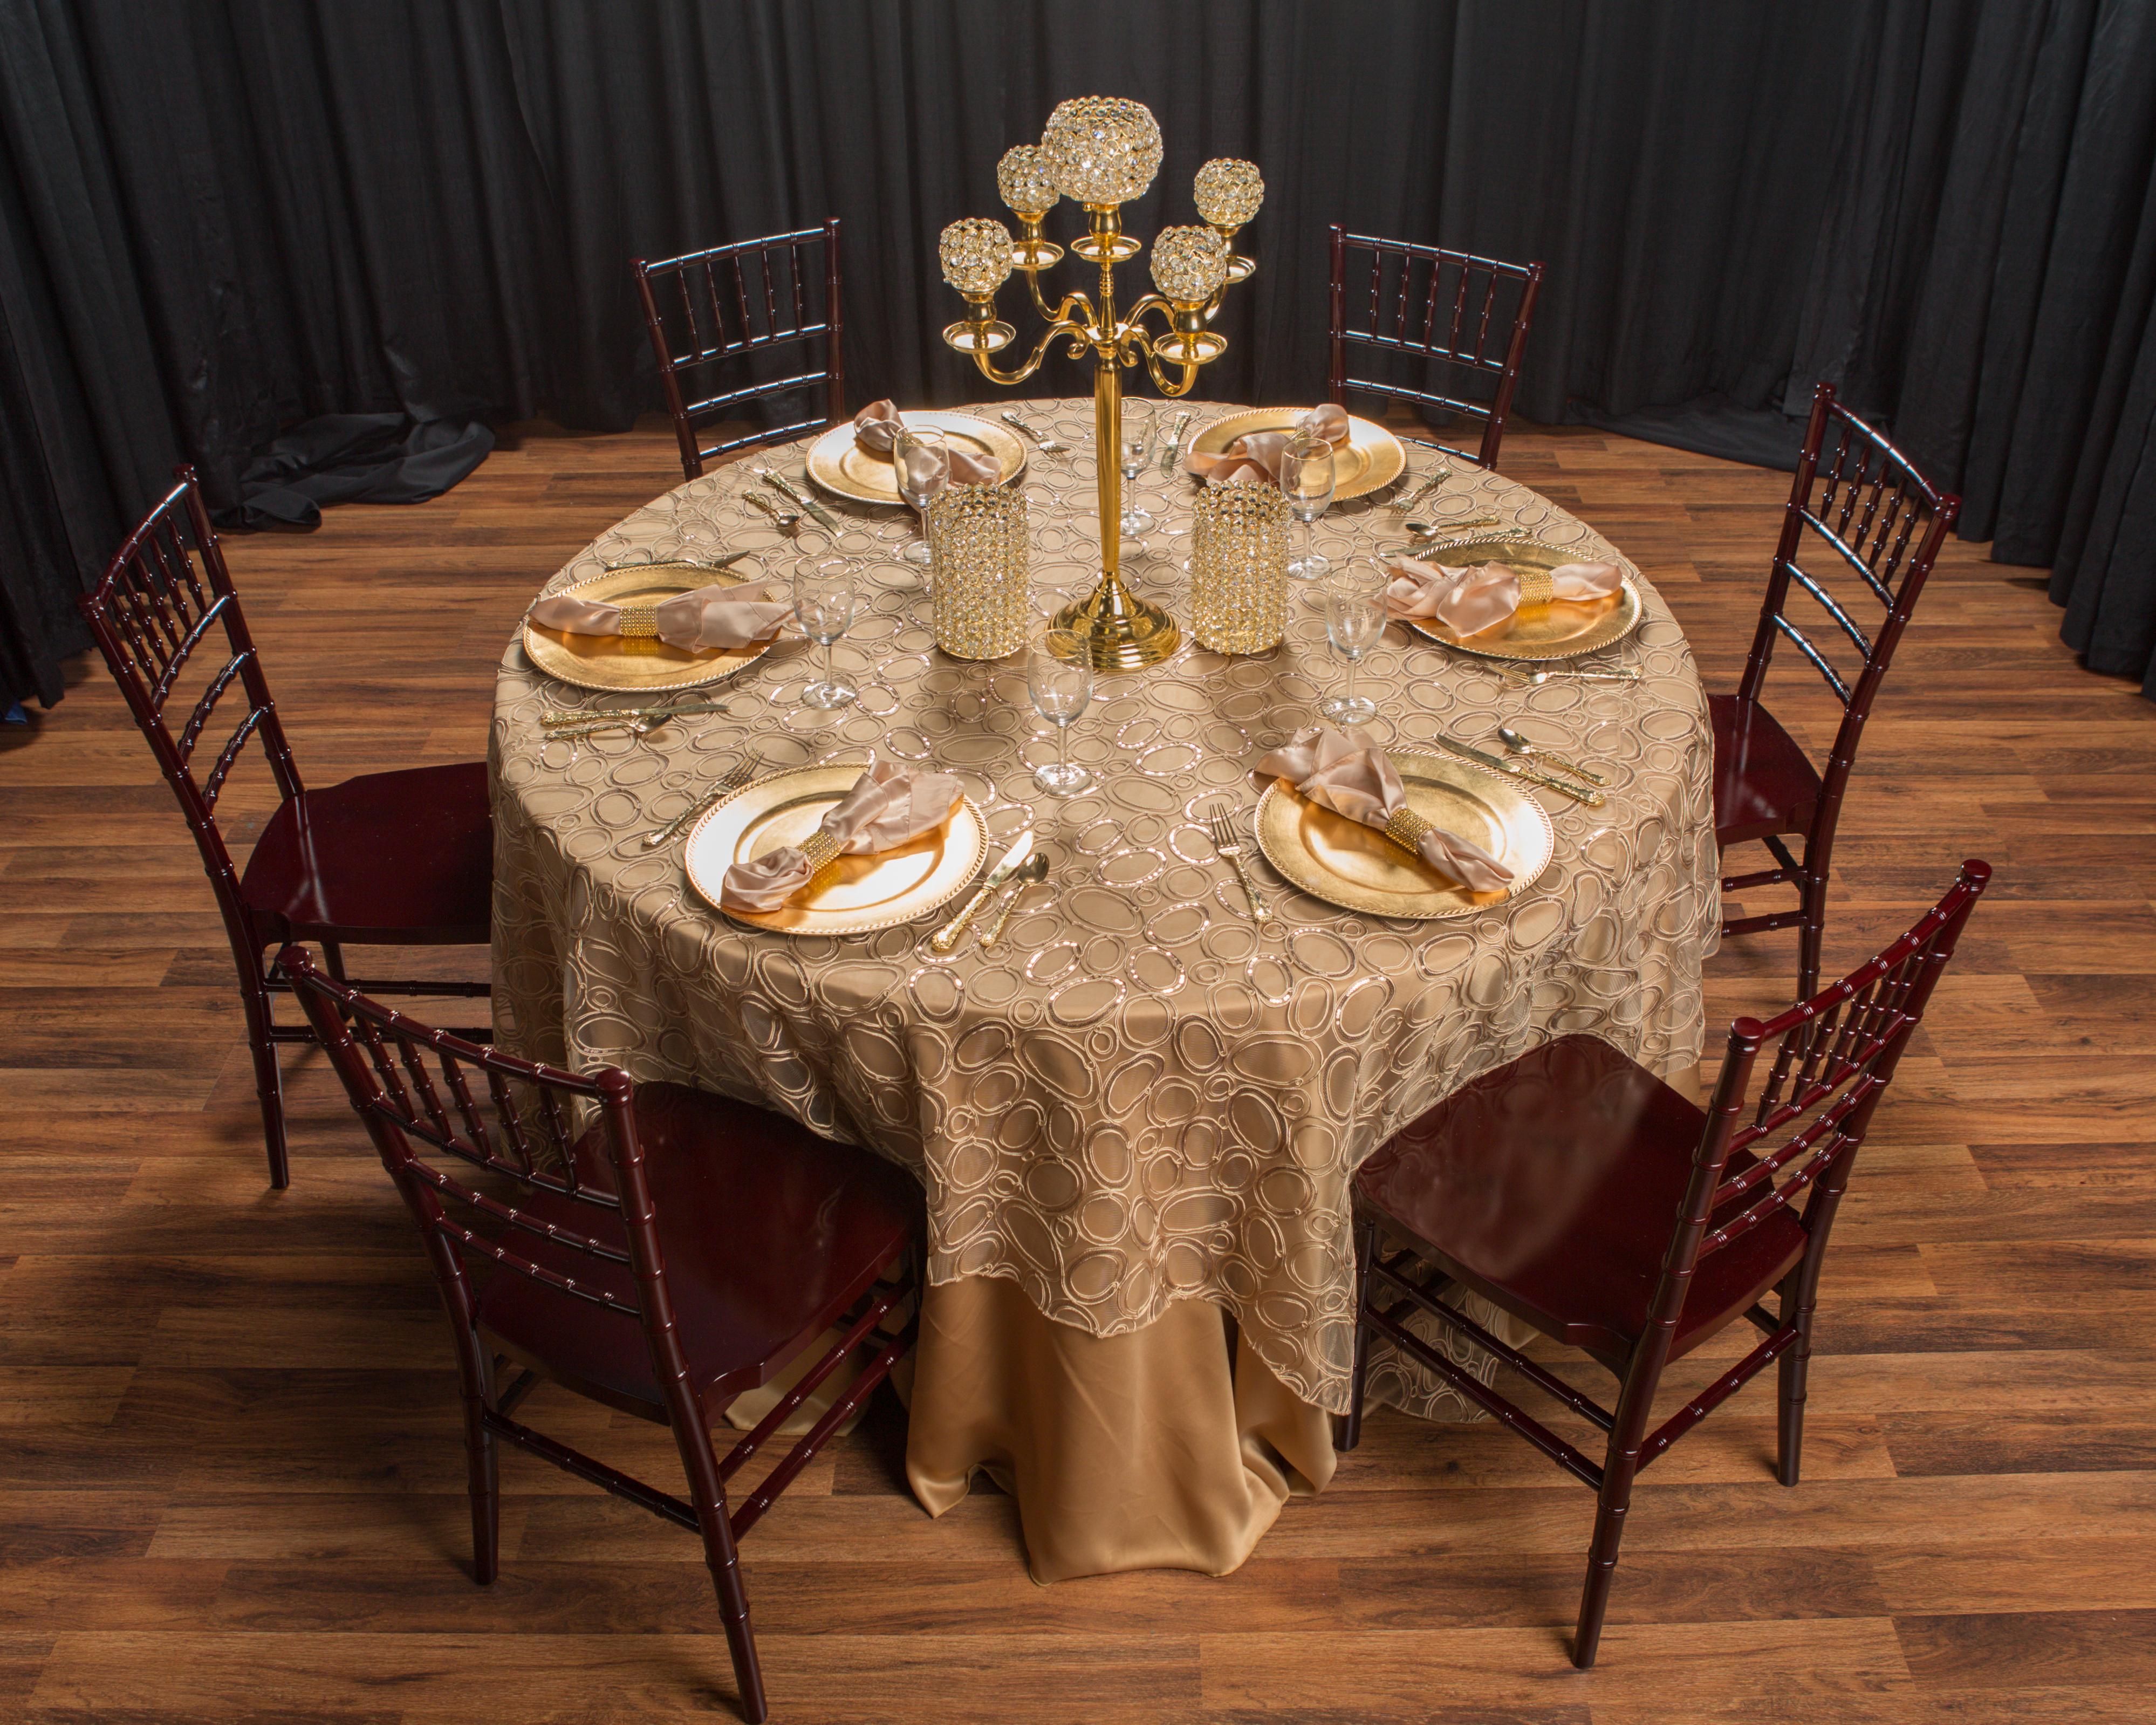 Linen Rentals A&S Party Rental Weddings